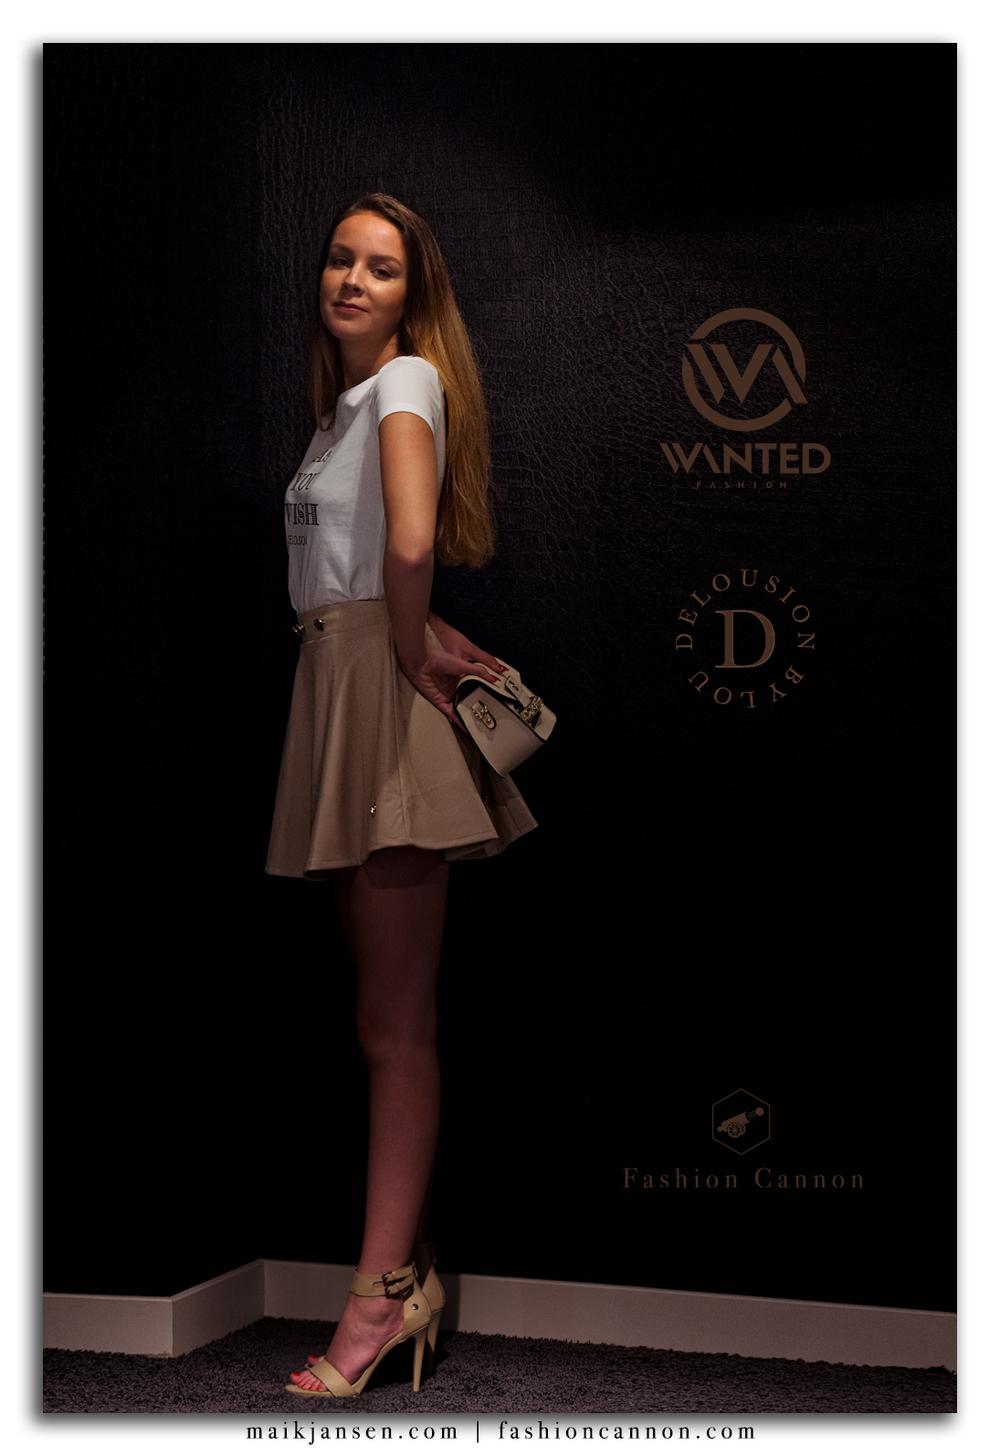 Ilaya_wanted_fashion-1.jpg